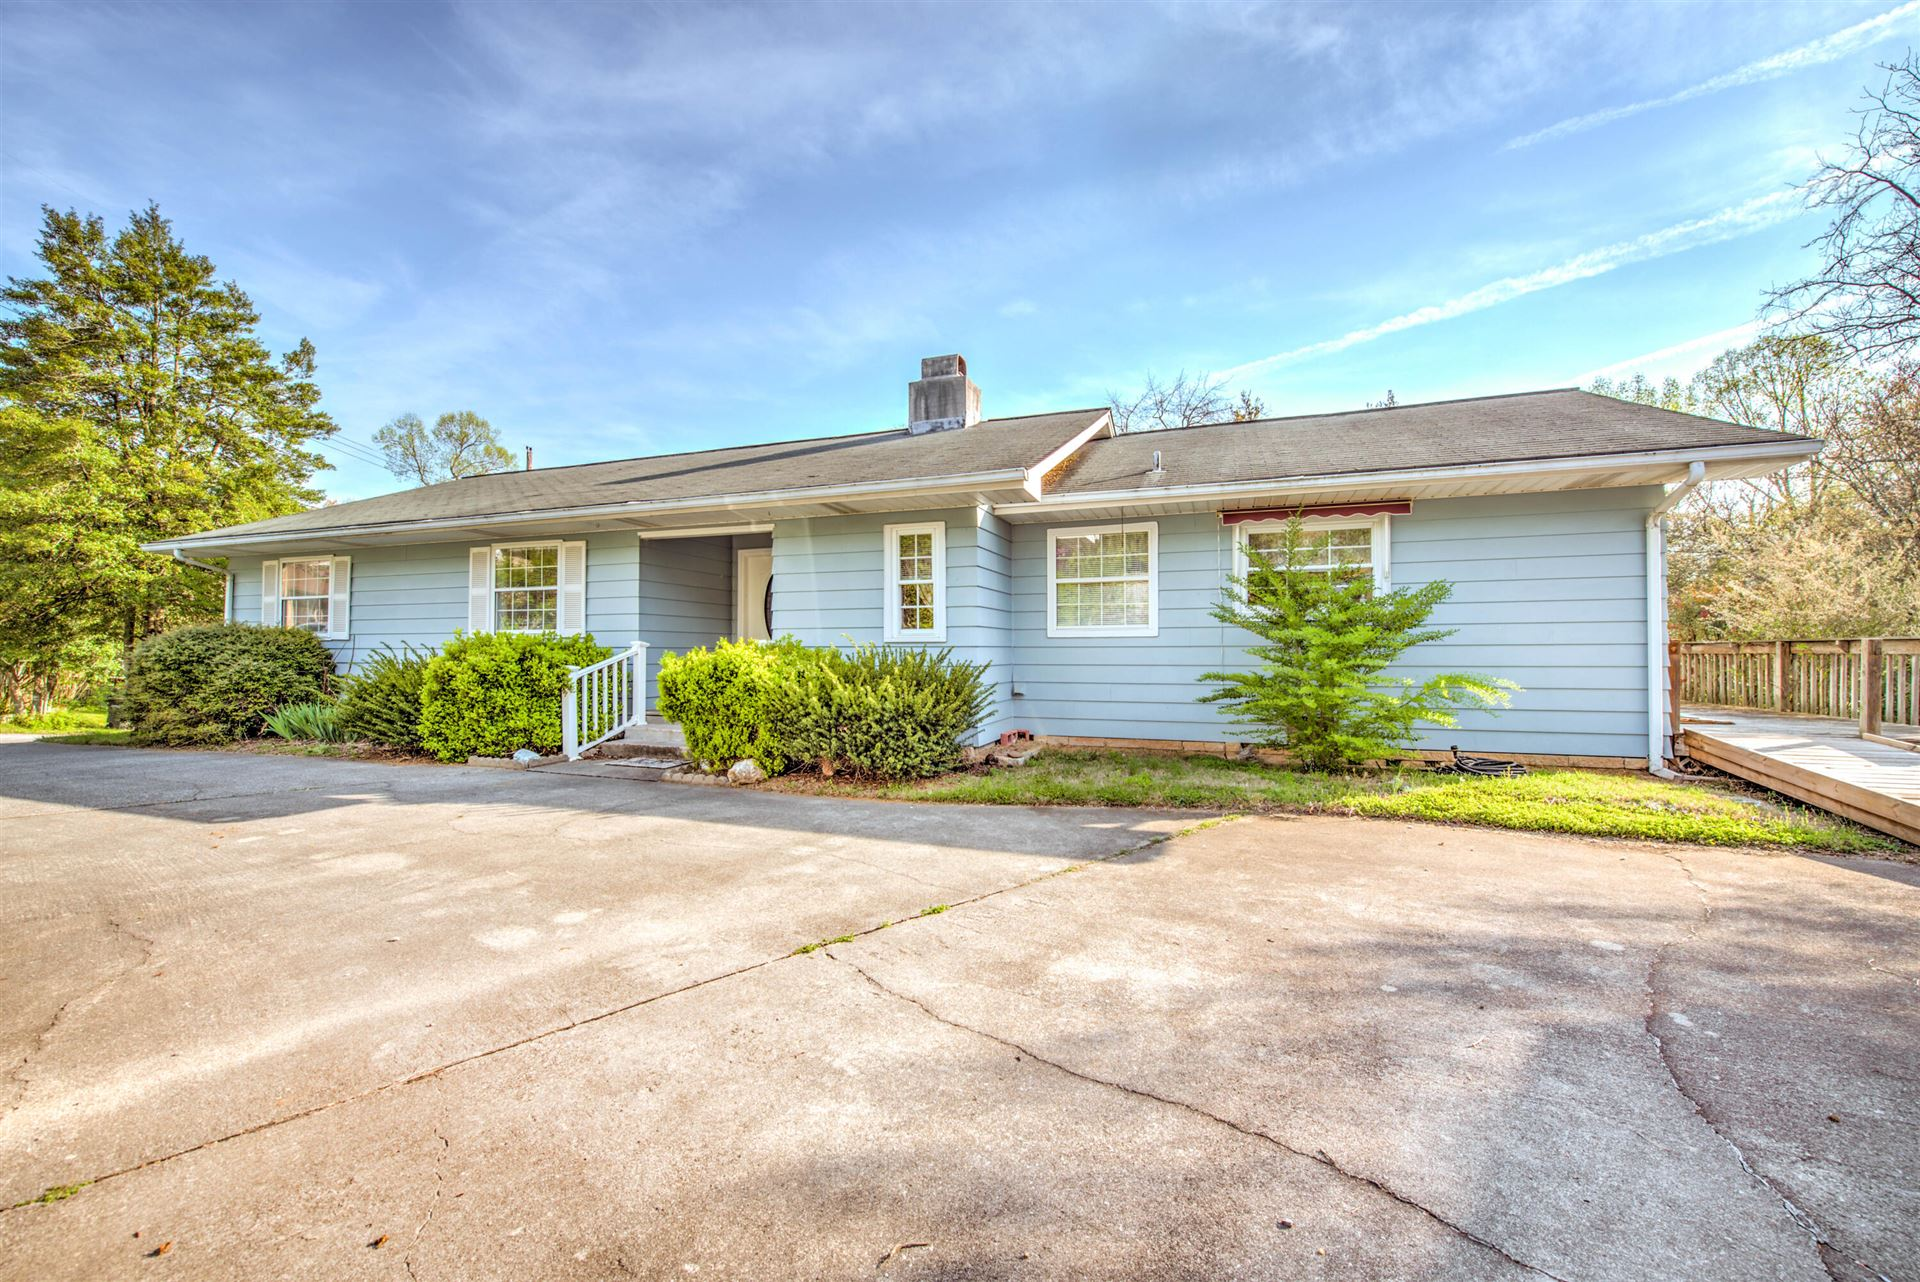 Photo of 109 Powell Rd, Oak Ridge, TN 37830 (MLS # 1148414)